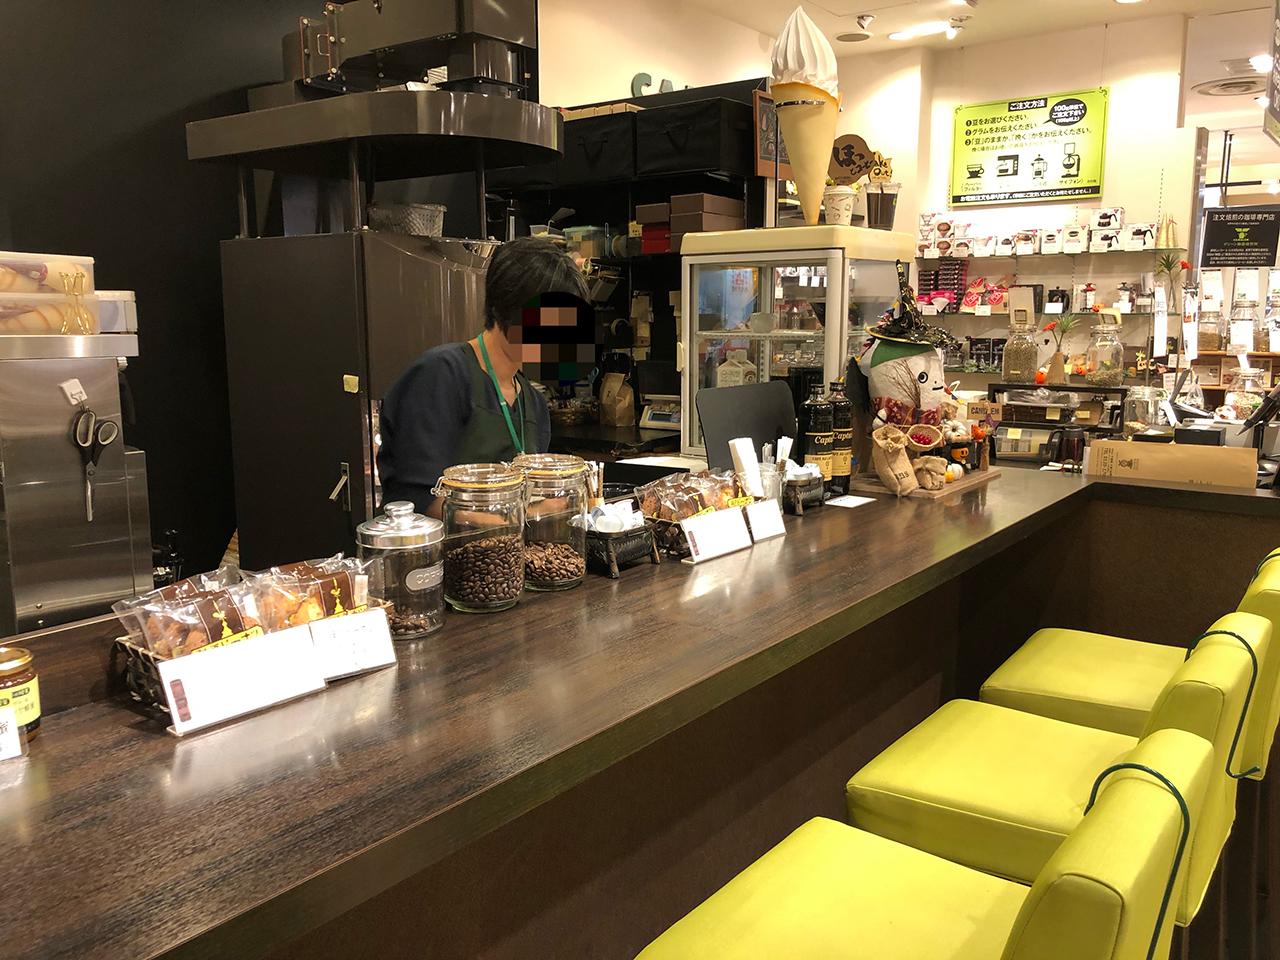 CAMBLEM(キャンブレム) グリーン珈琲焙煎所 モリシア津田沼店の投稿写真3